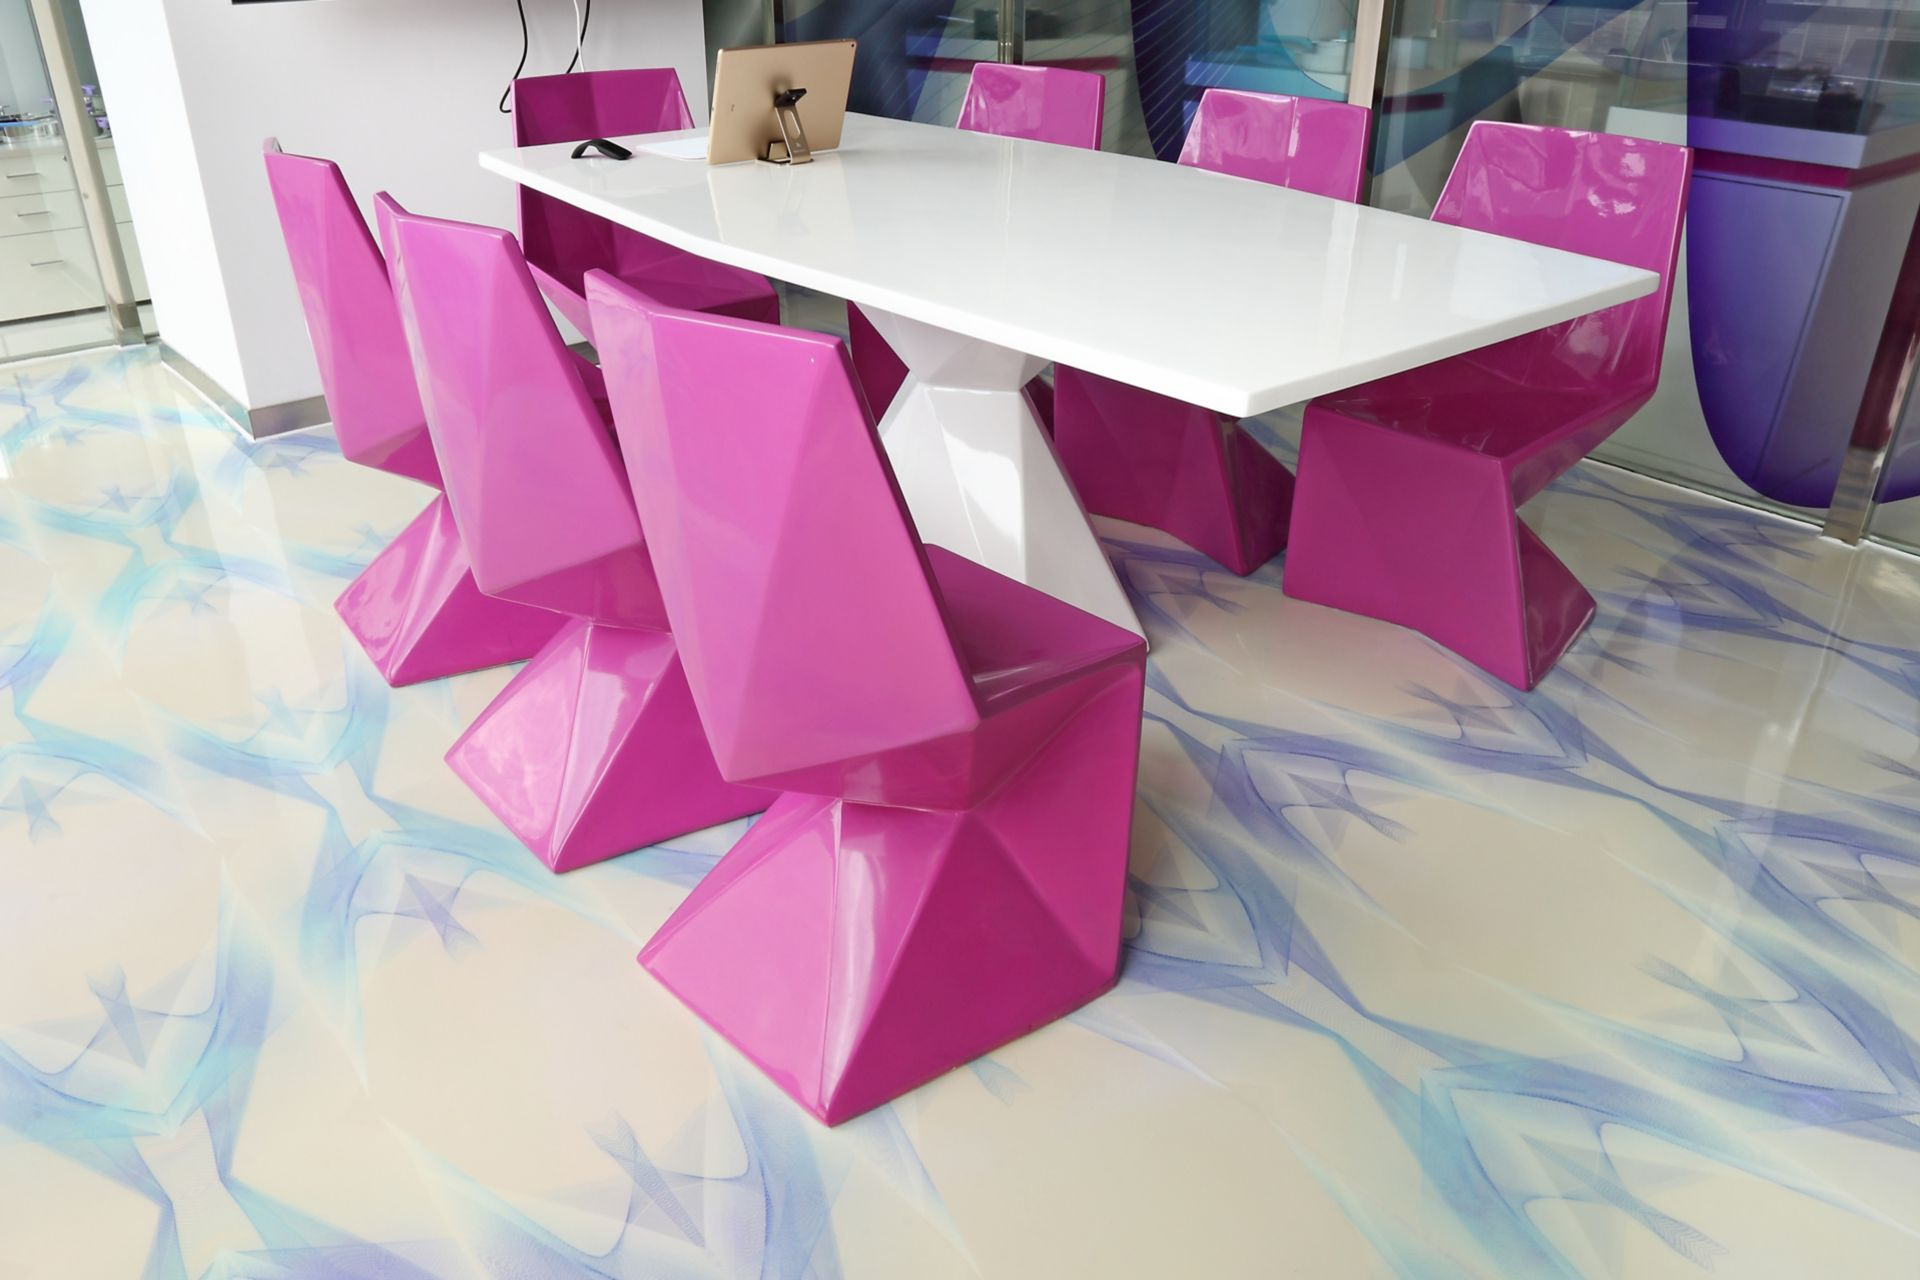 Sika ComfortFloor® pattern floor at Karim Rashid Design Institute in China